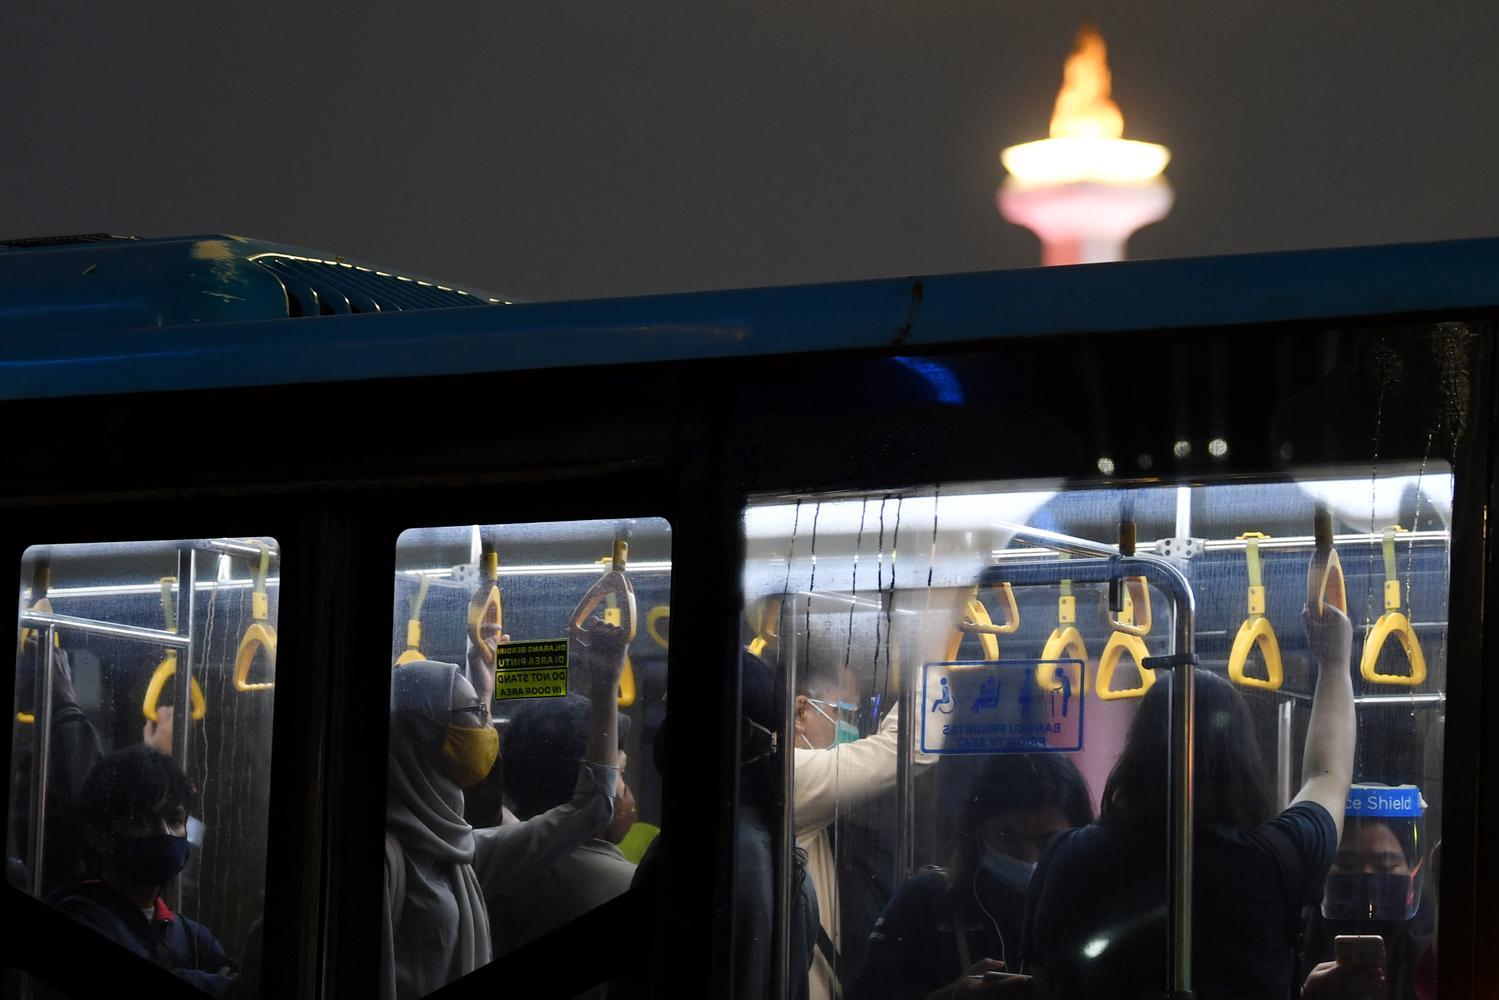 Penumpang menaiki Bus Transjakarta saat melintasi kawasan Pantung Arjuna Wiwaha, Jakarta, Rabu (6/1/2021). Pemerintah melakukan pengetatan pembatasan pergerakan di Jawa dan Bali pada 11-25 Januari 2021 untuk menekan penyebaran COVID-19, diantaranya dengan melakukan pembatasan kapasitas dan operasional transportasi umum.